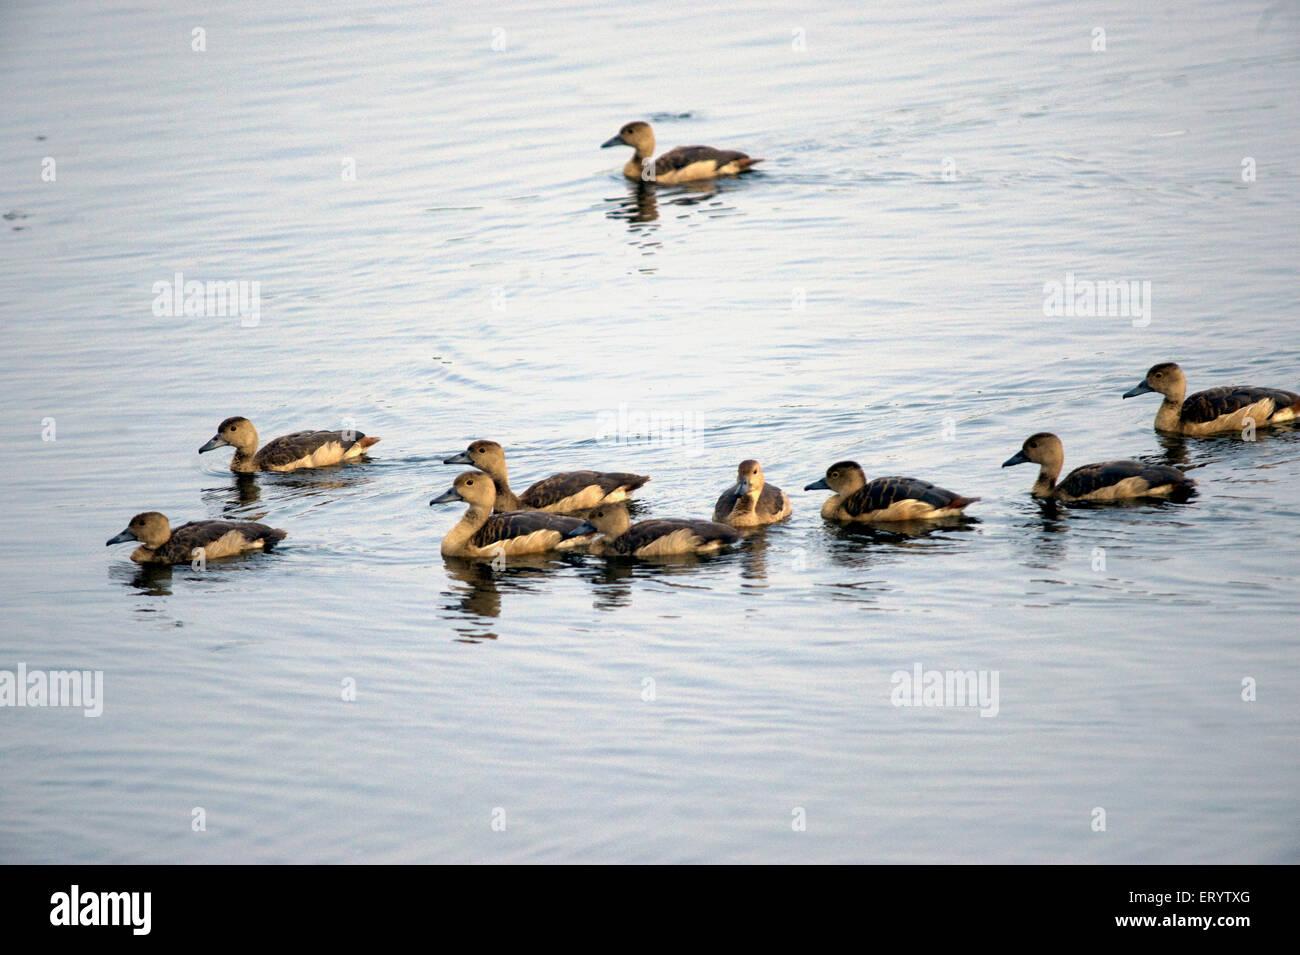 Birds ; siberian lesser whistling ducks dendrocygna javanica in water in Santrgachhi lake ; Howrah ; West Bengal - Stock Image